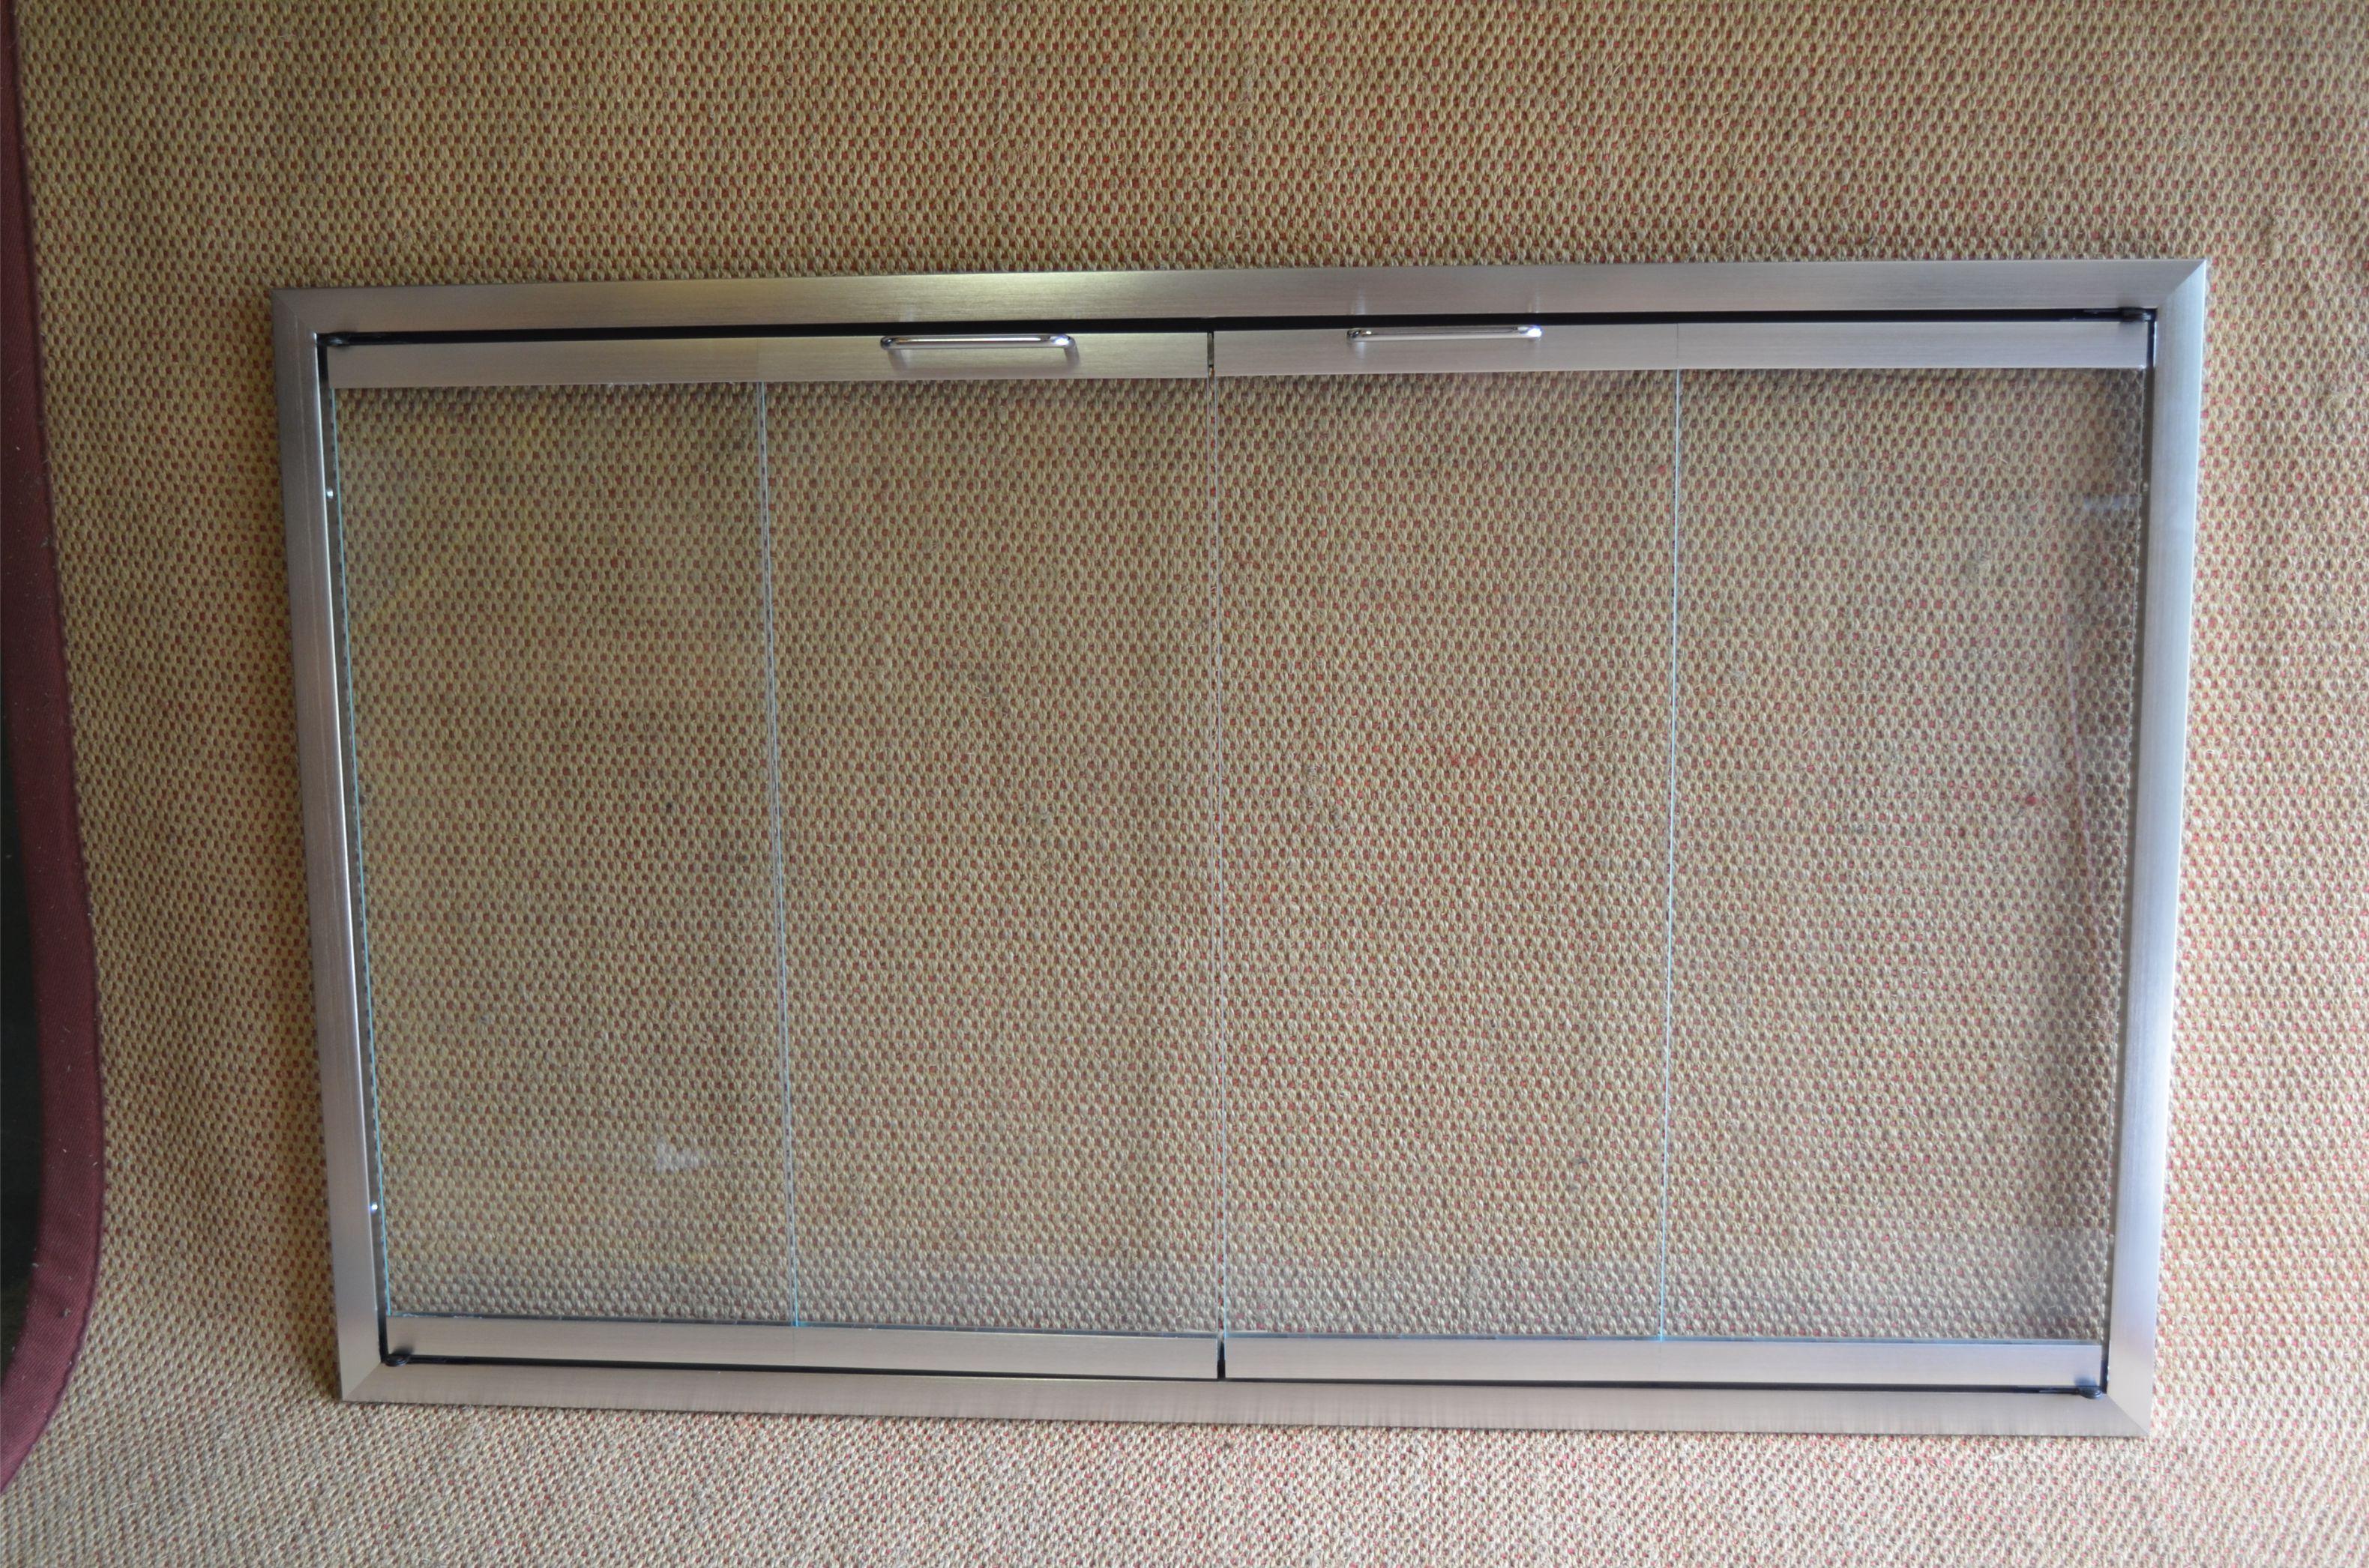 2092 #604E38 Fast Shipping Zero Clearance Doors wallpaper Clearance Doors 46853160